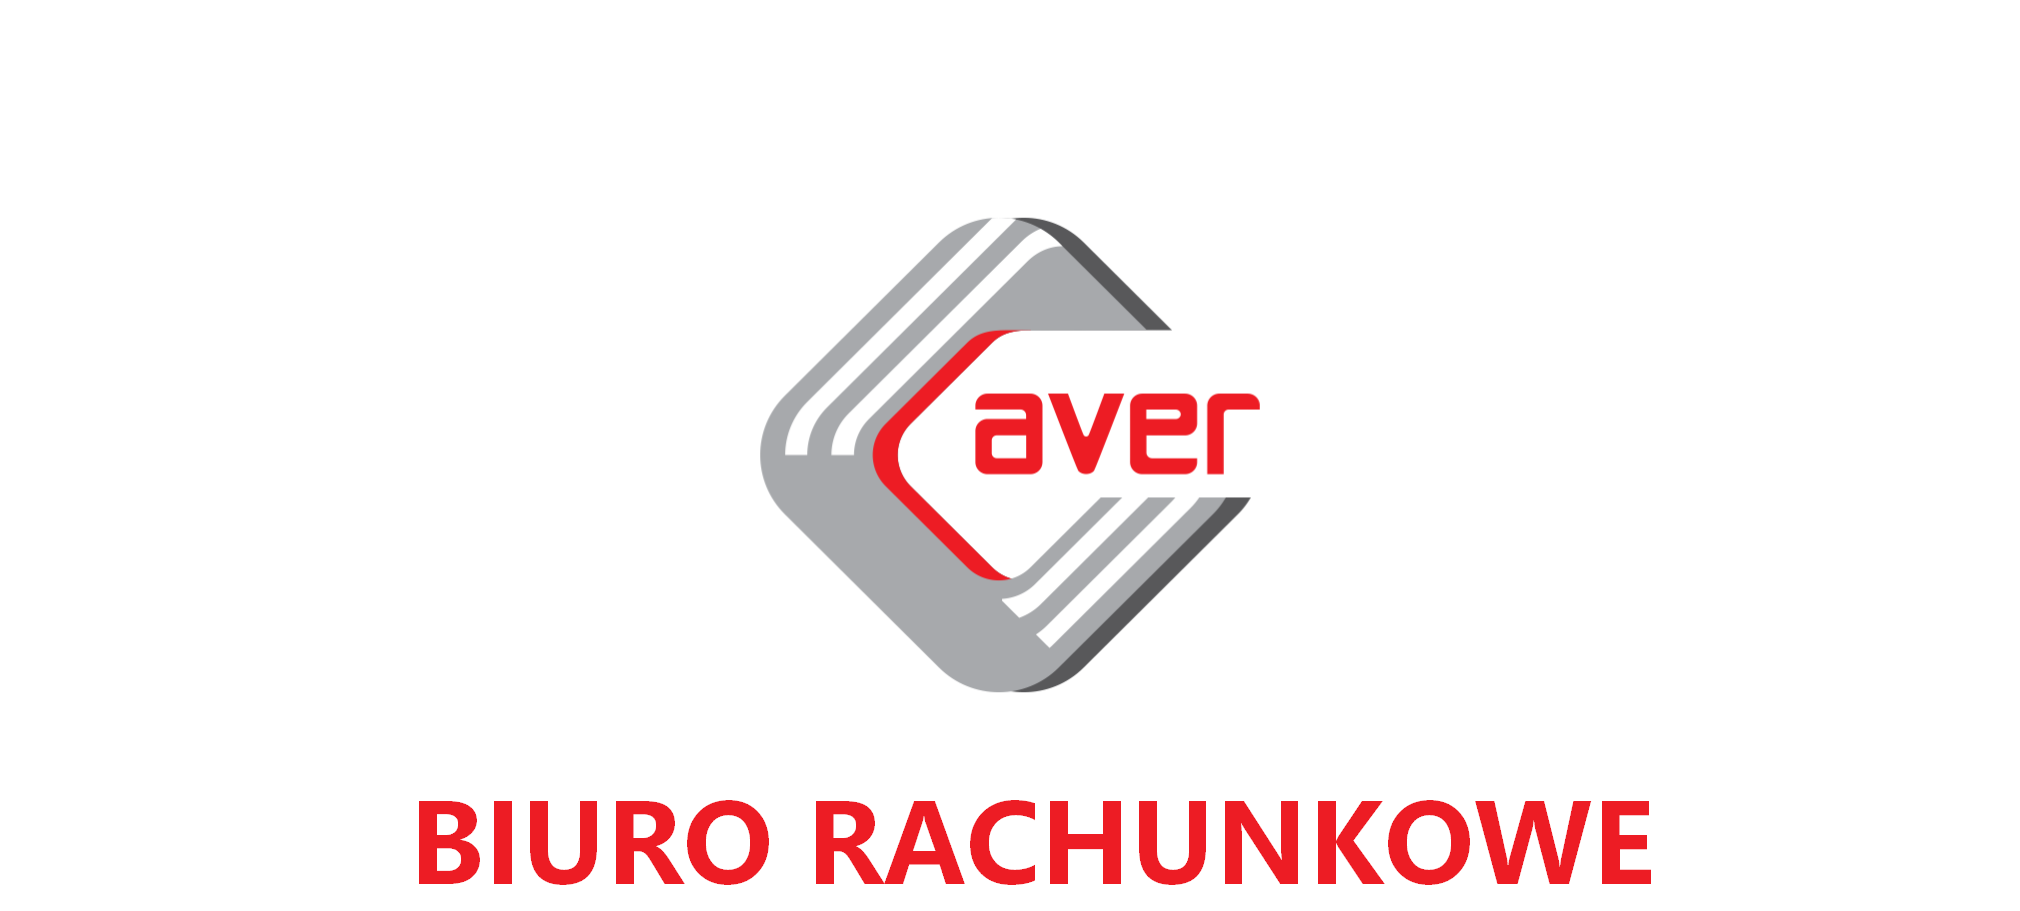 Caver - biuro rachunkowe